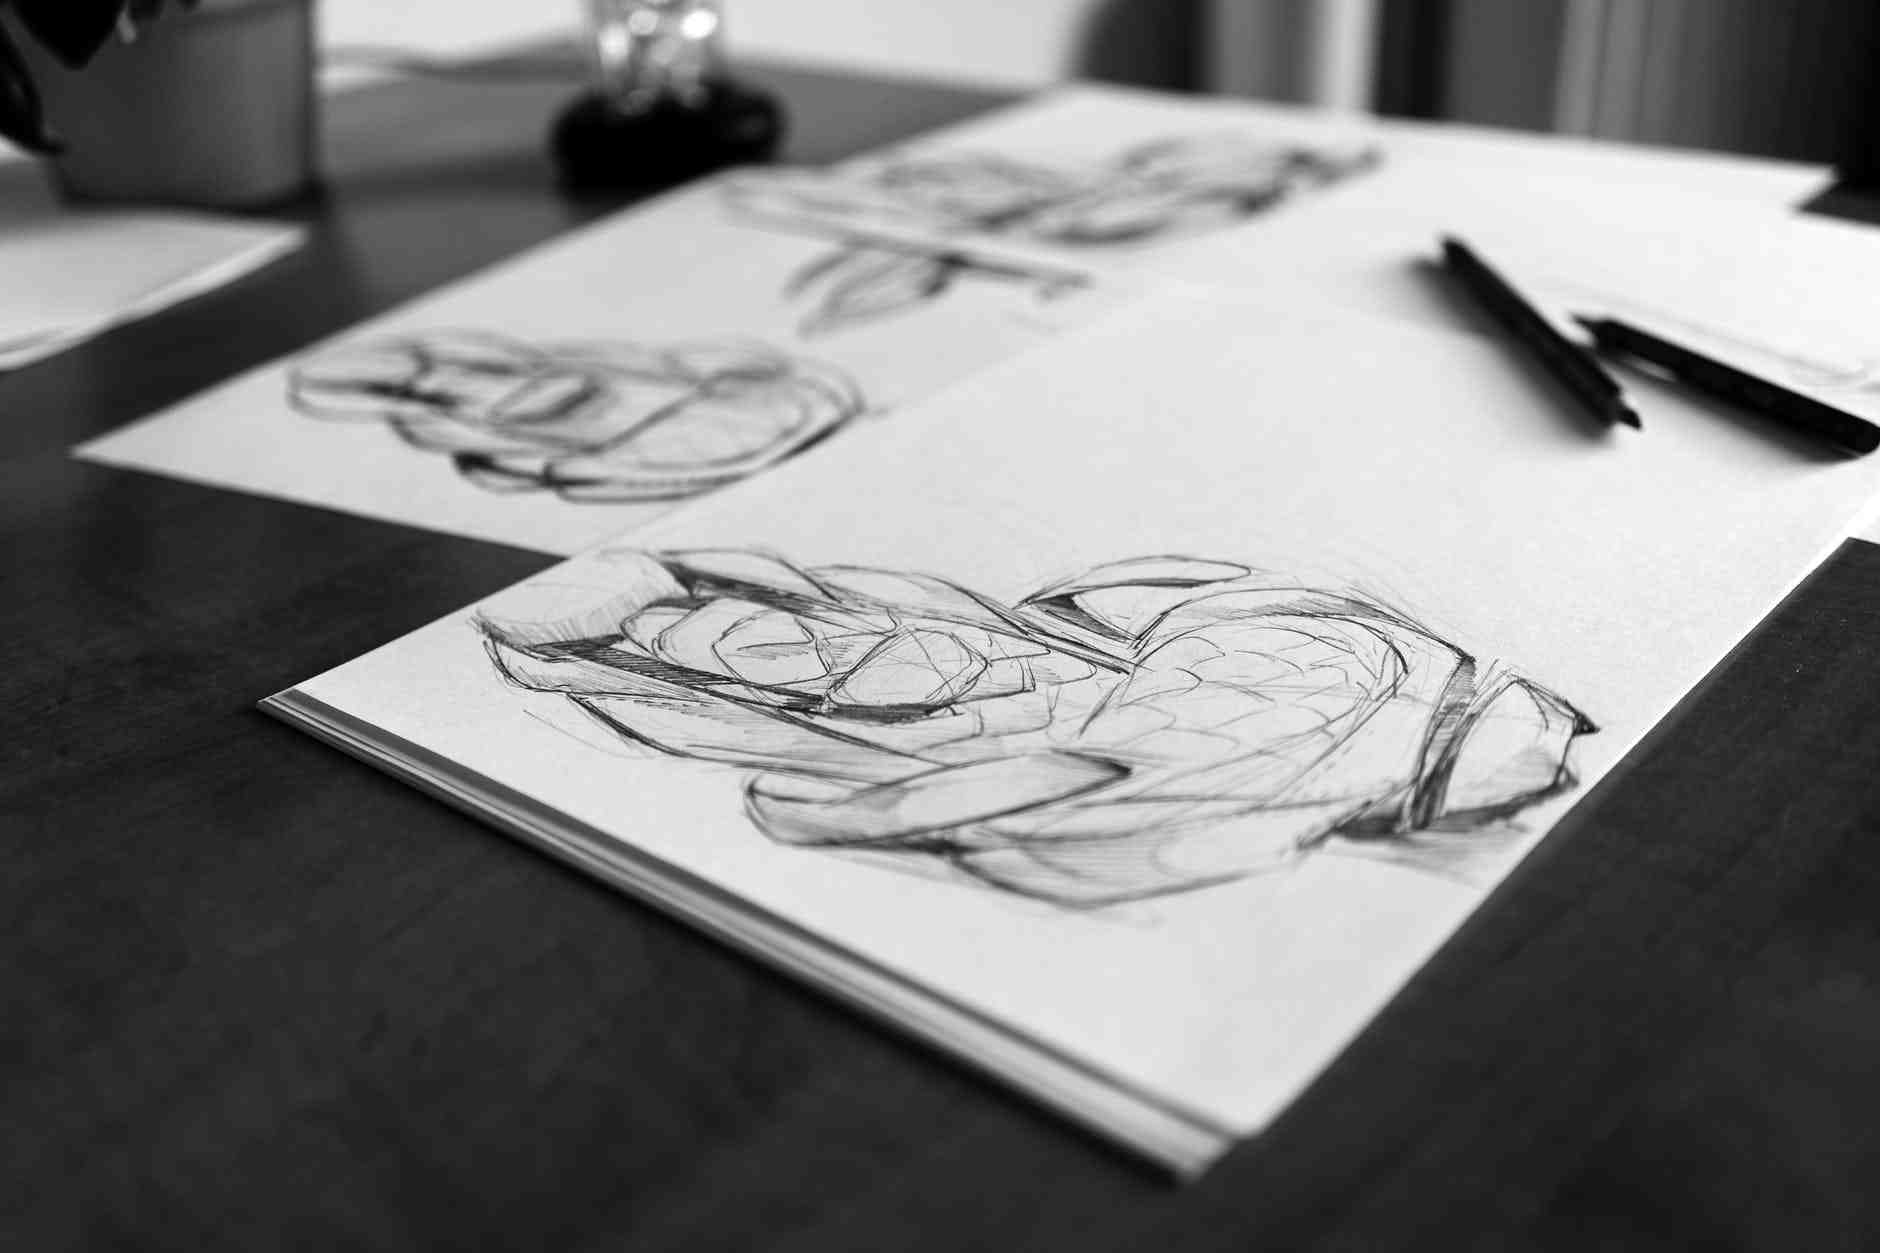 konsep seni rupa membuat sketsa